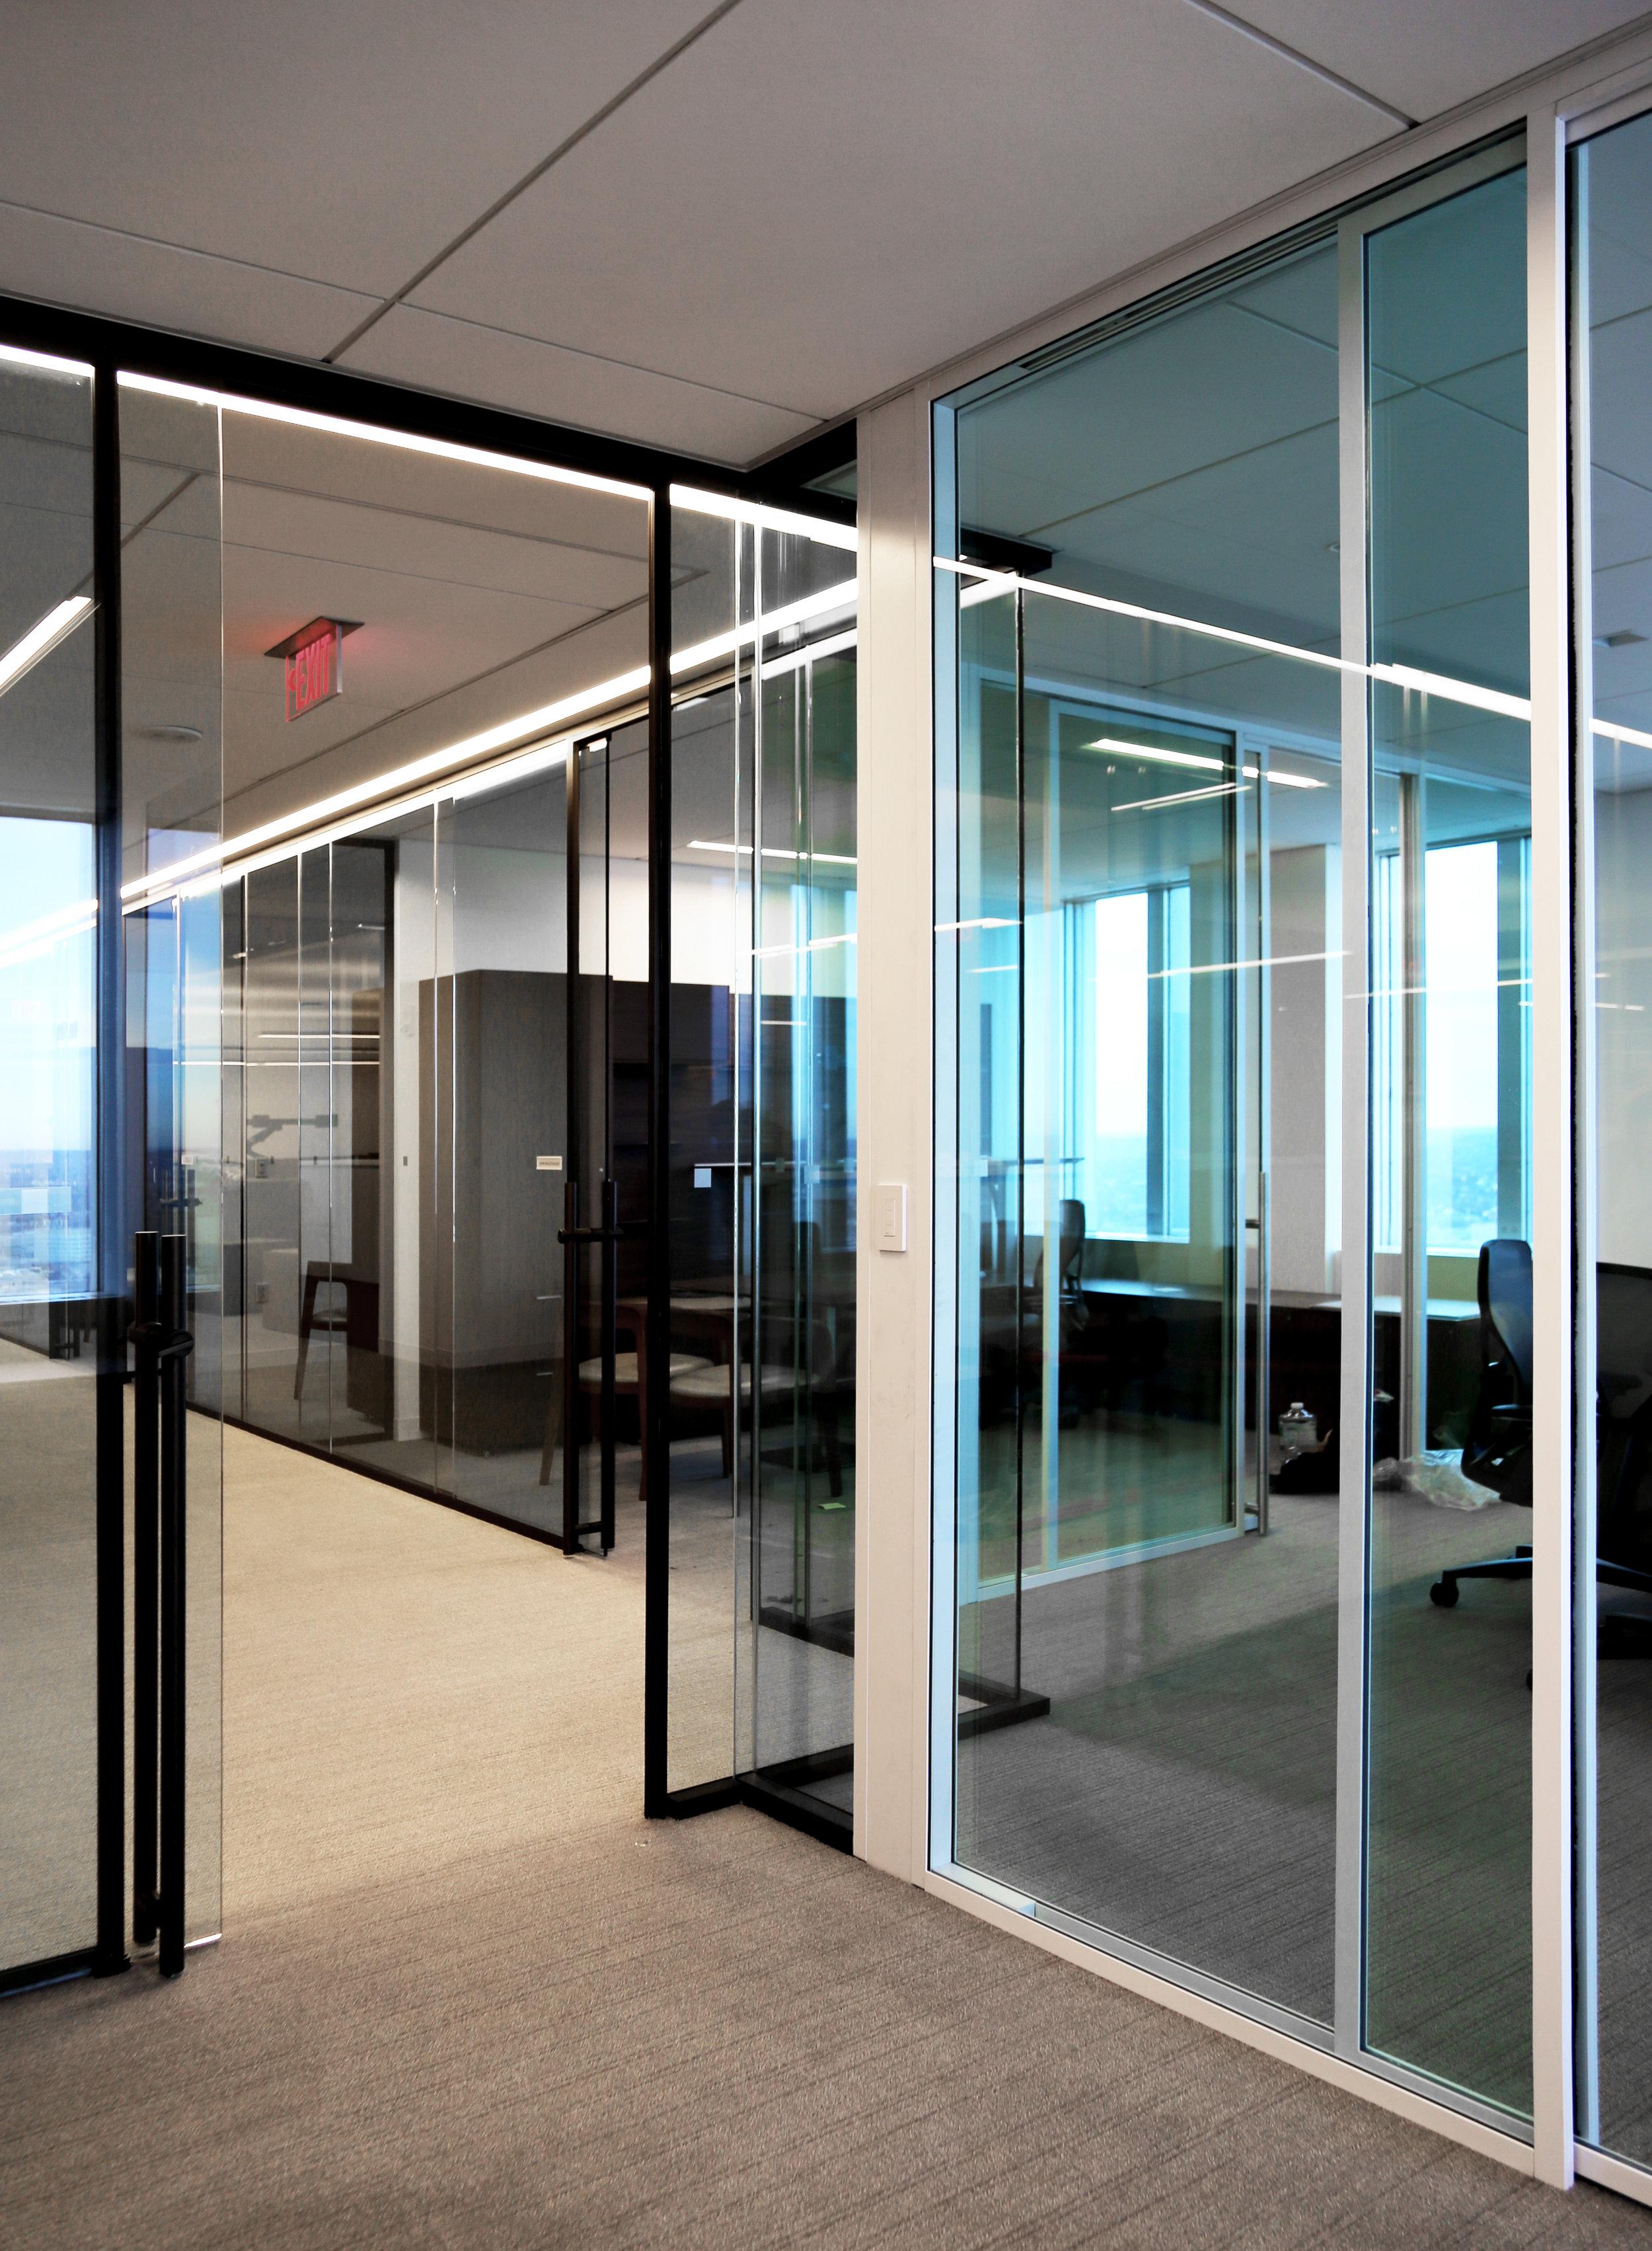 Modernus Aluminum Framed Dual Glazed Wall Conference Room Office Front - Spaceworks AI.jpg